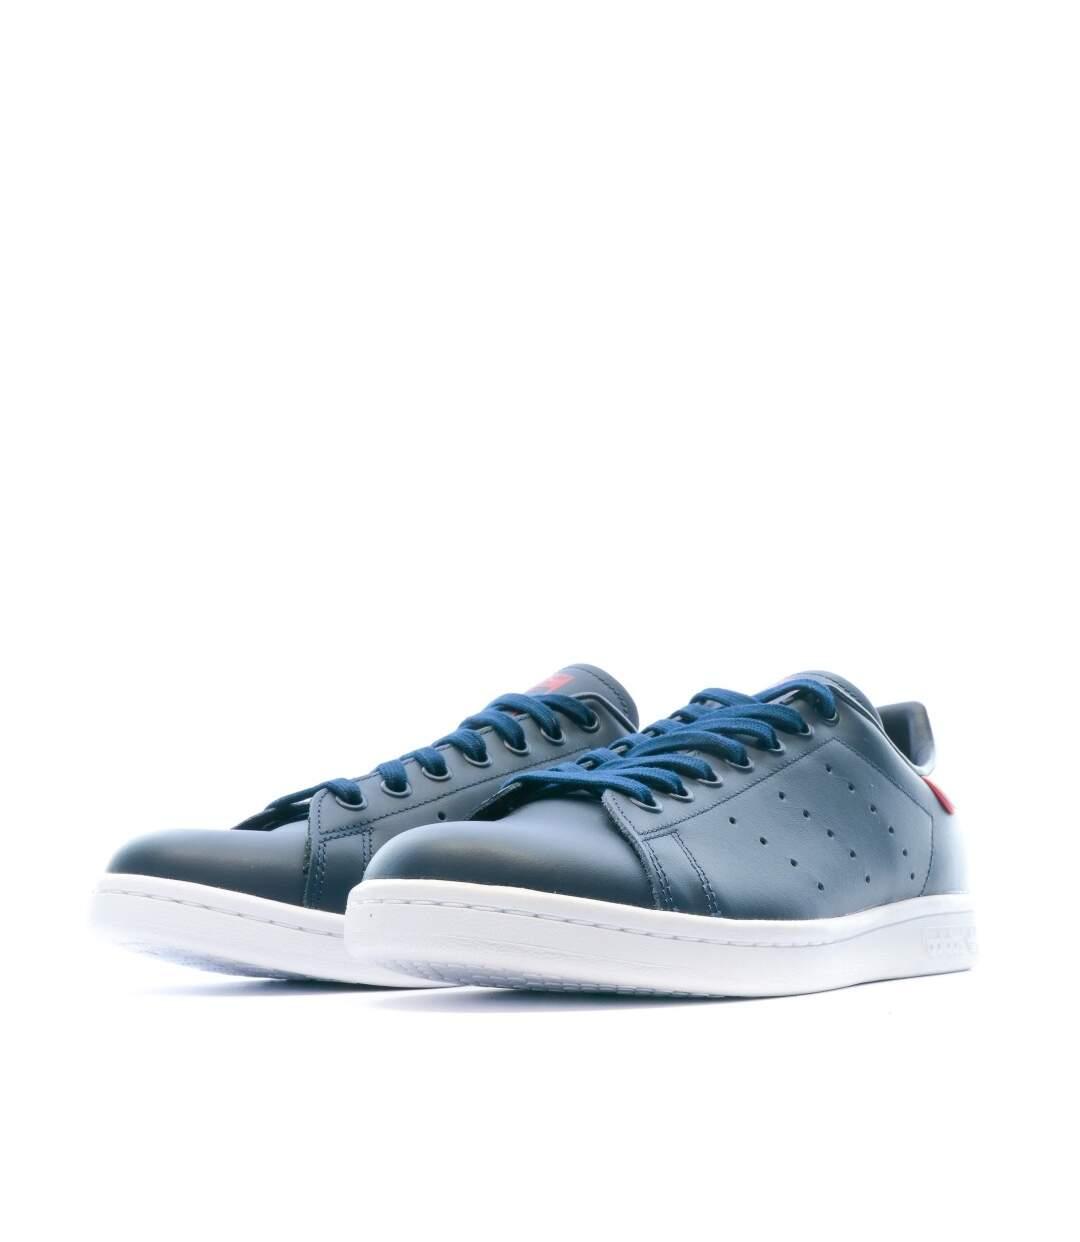 Grande Vente Stan Smith Sneakers Marine Homme Adidas Originals dsf.d455nksdKLFHG